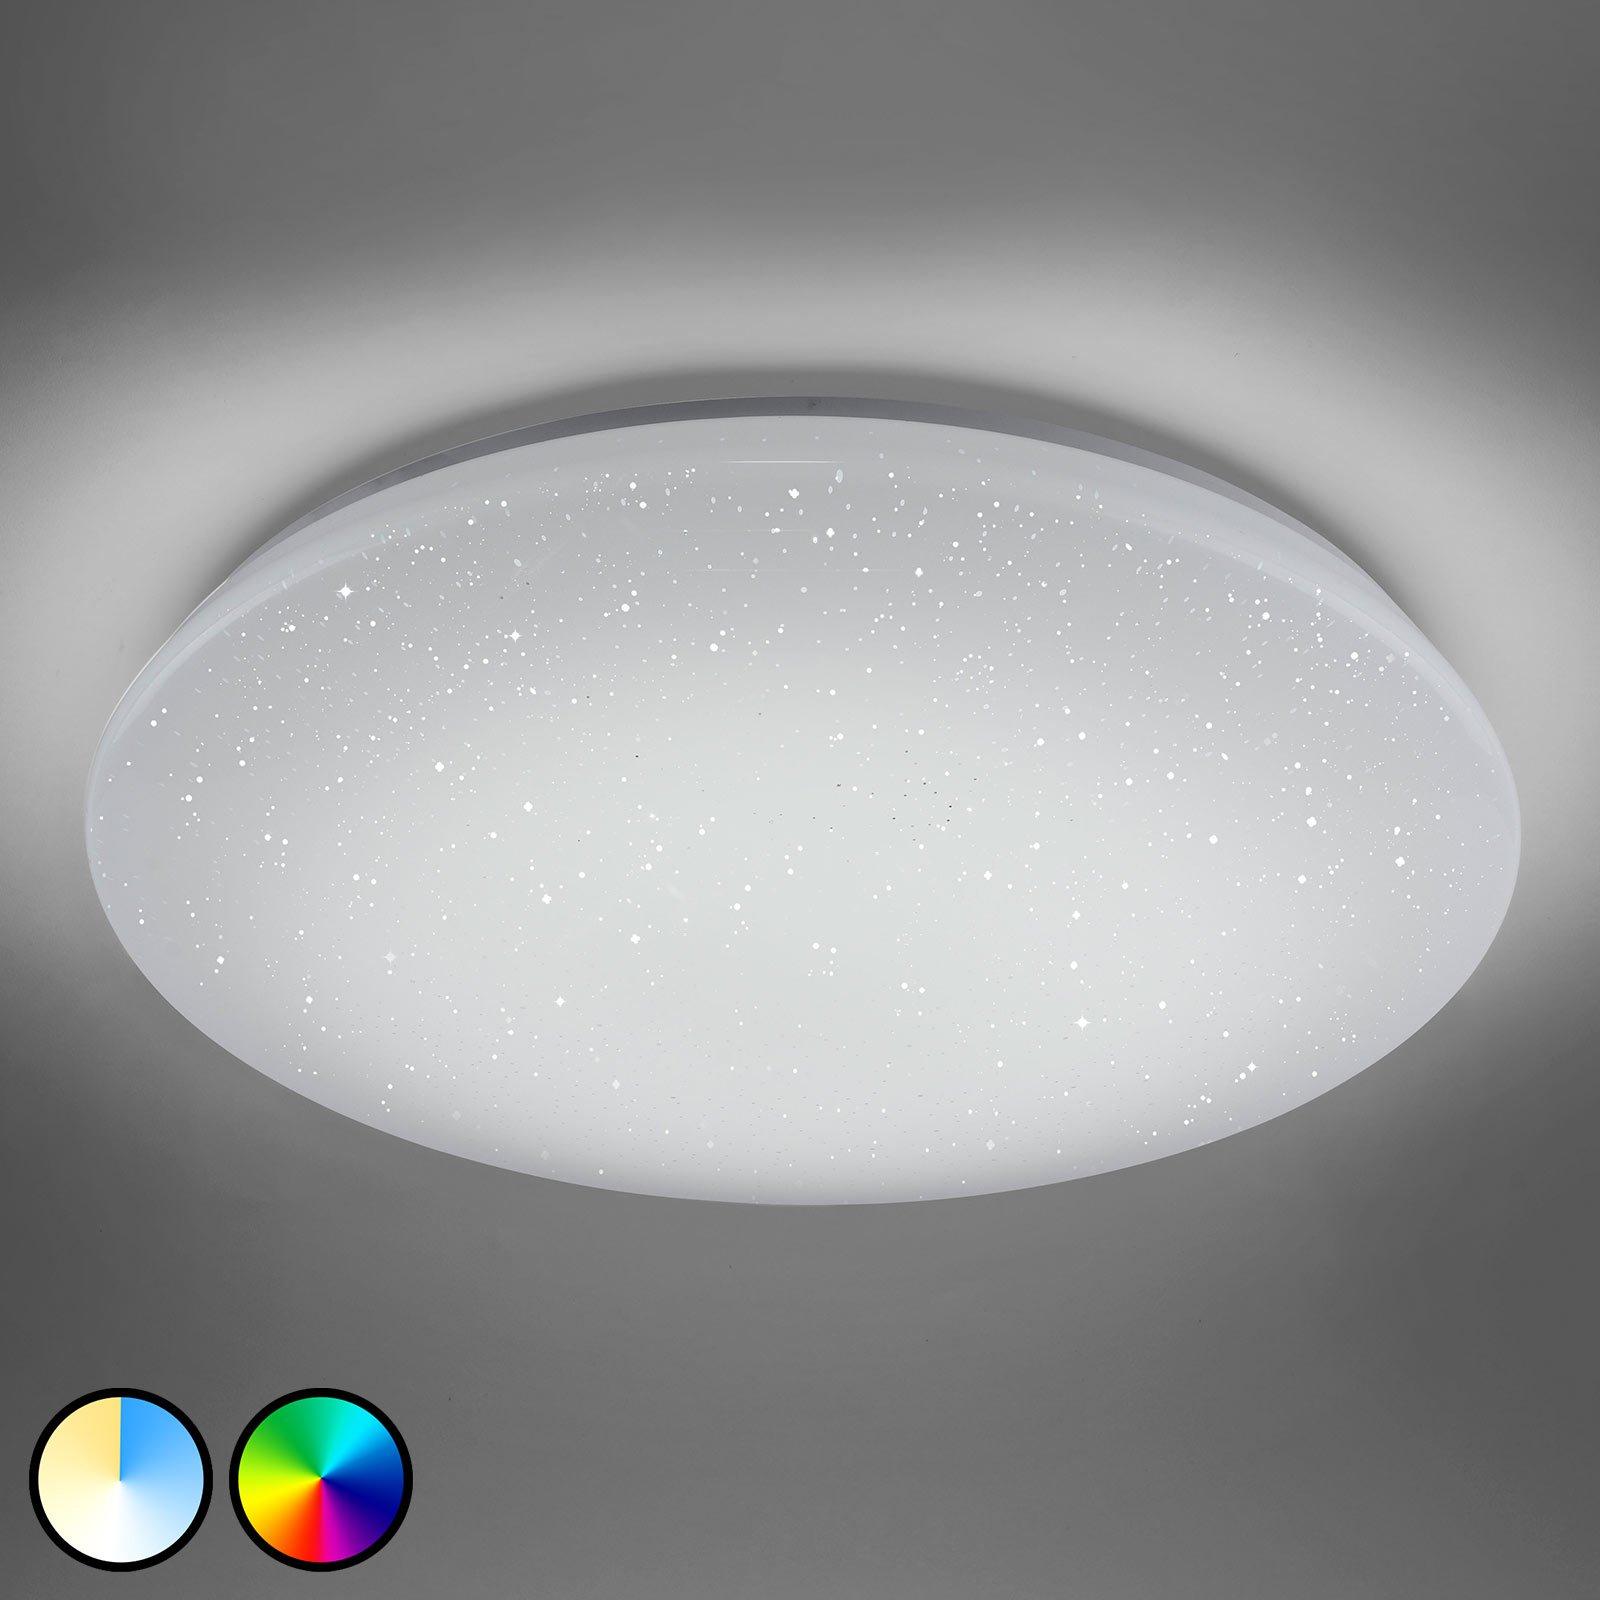 Trio WiZ Charly LED-taklampe med krystalleffekt